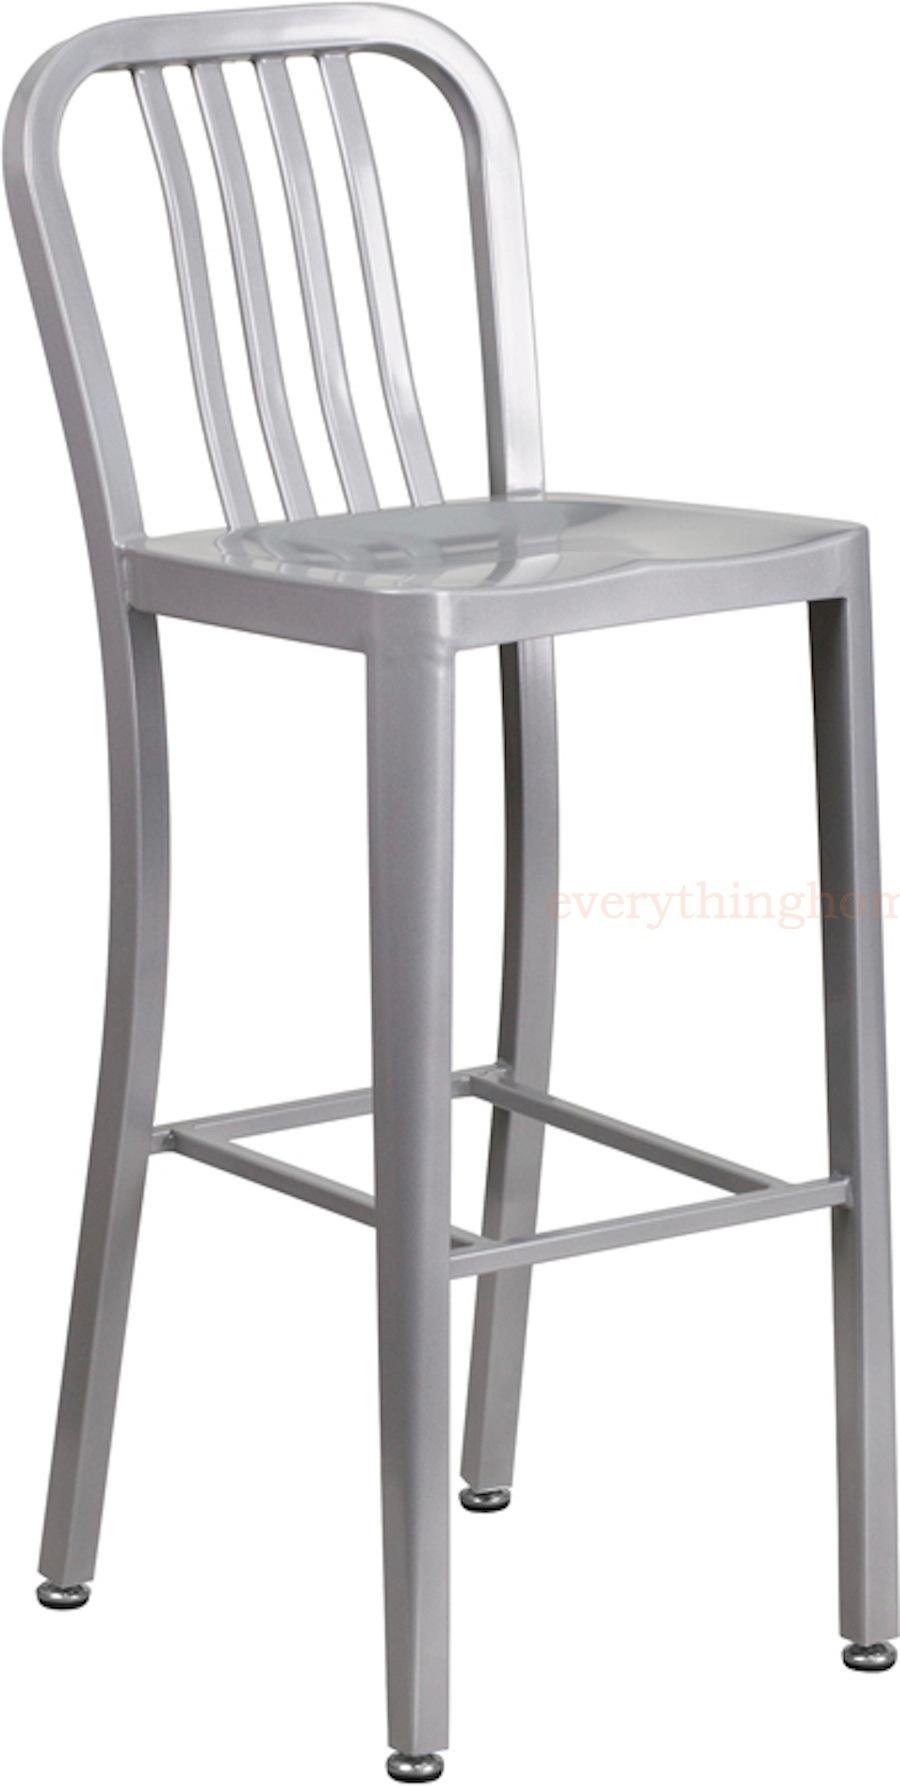 Style Bar Stool High Top Chair